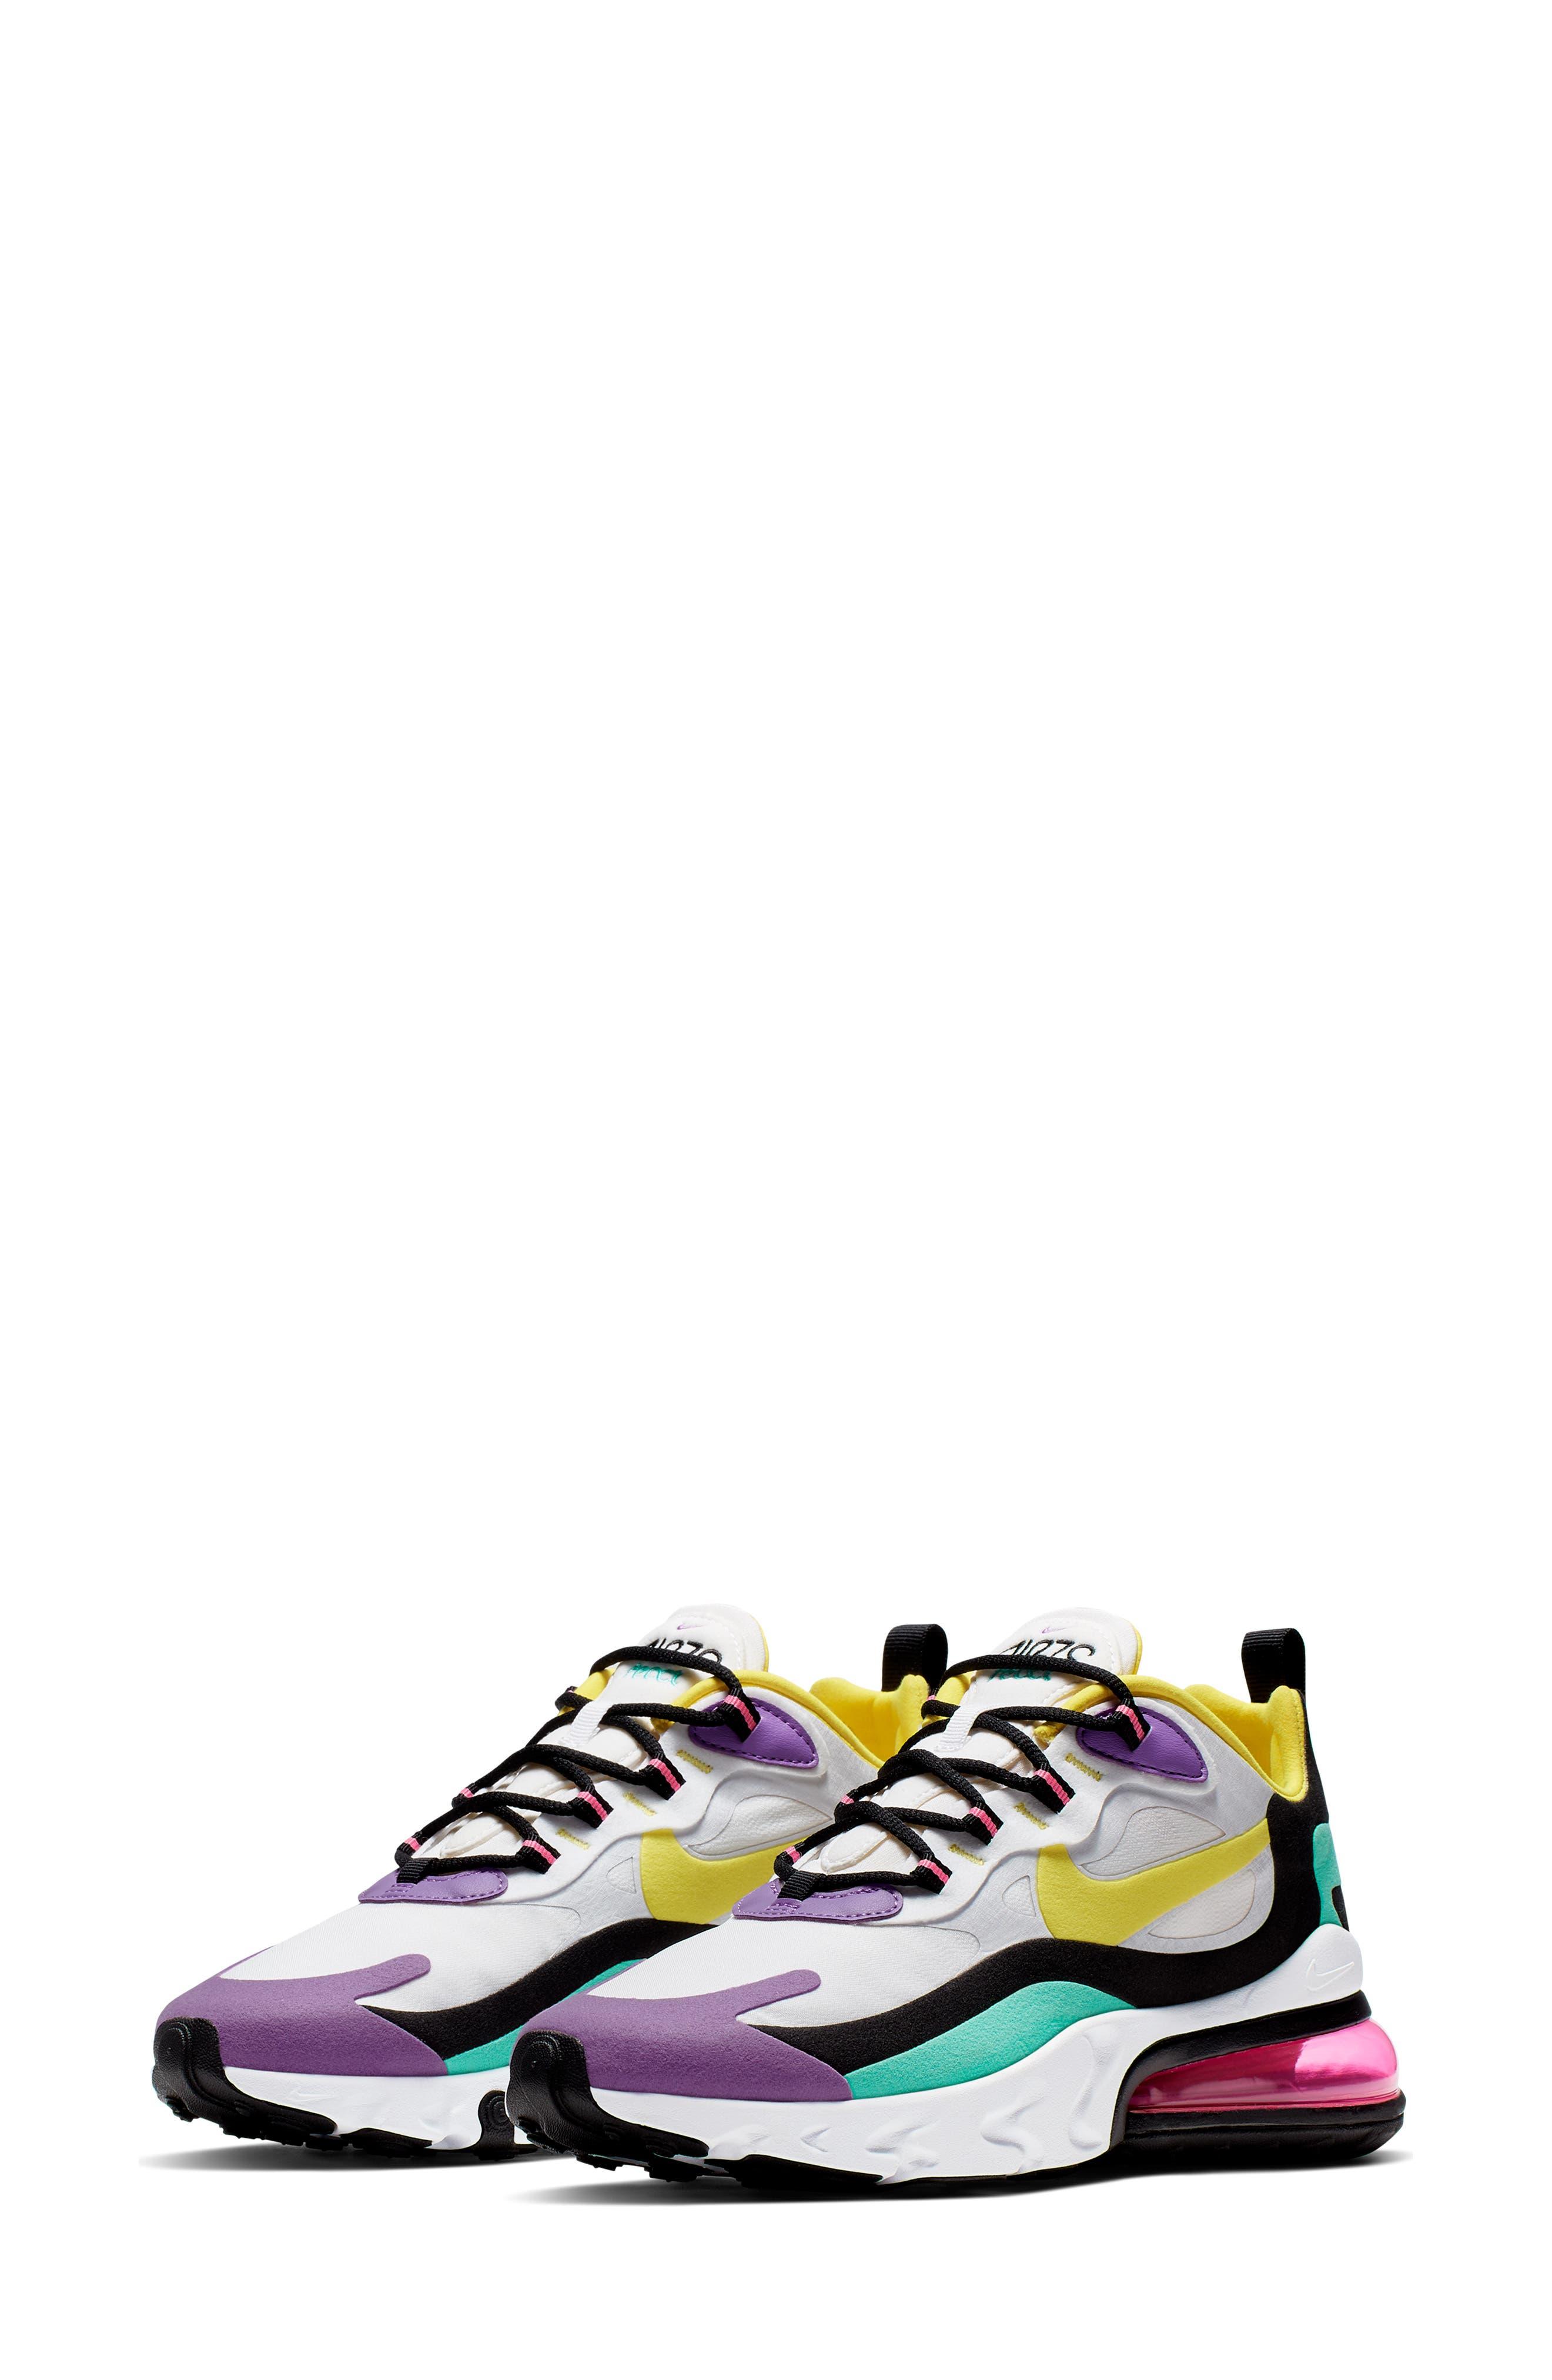 Cheap Nike Air Max 1 Essential Nike New Arrival Shoes mens womens Sneaker WhiteBlackWhite for sale black friday 2018 2017